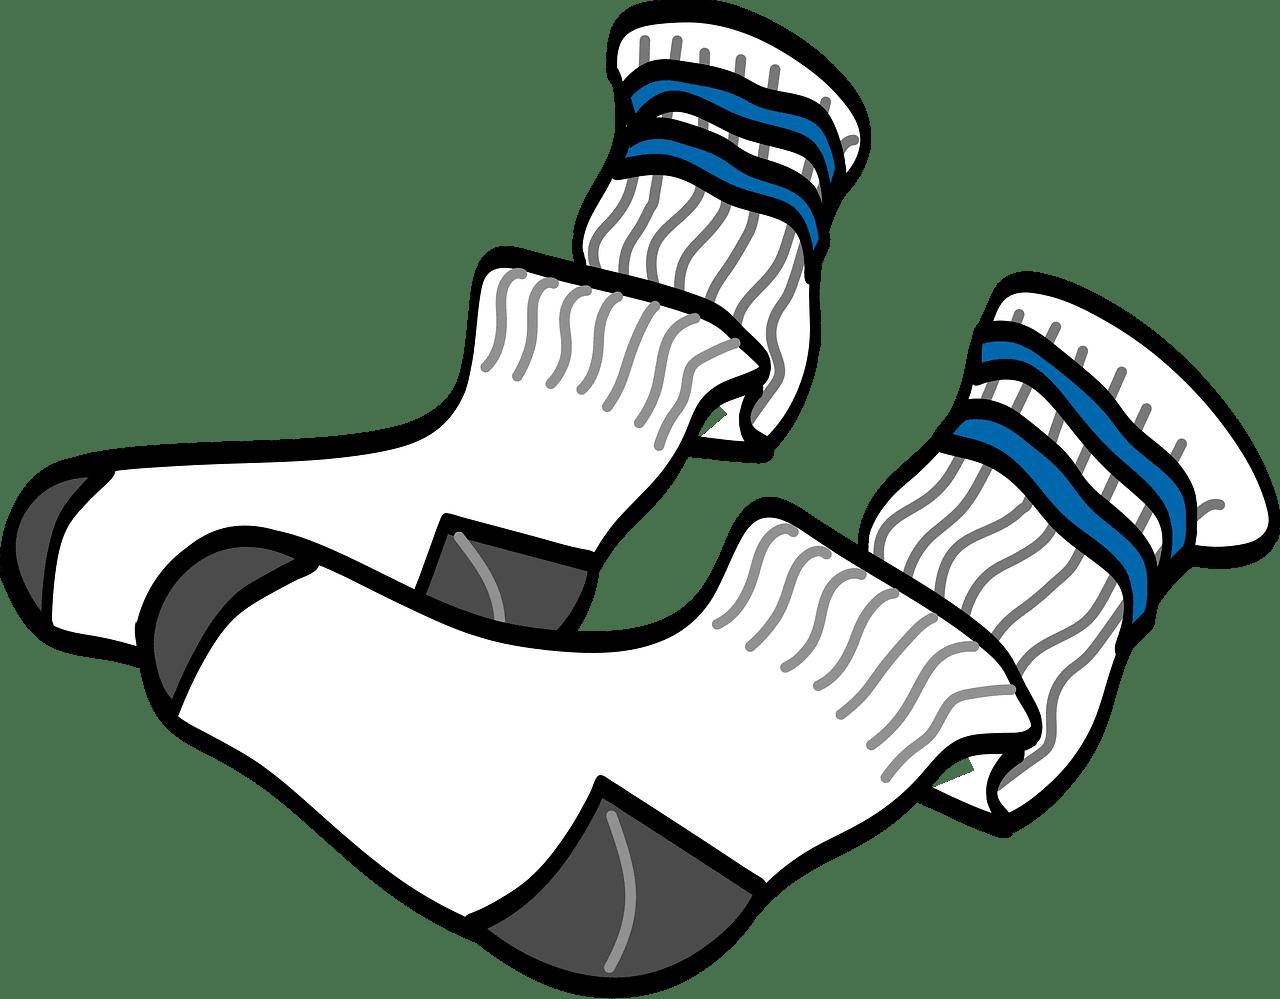 Socks clipart transparent